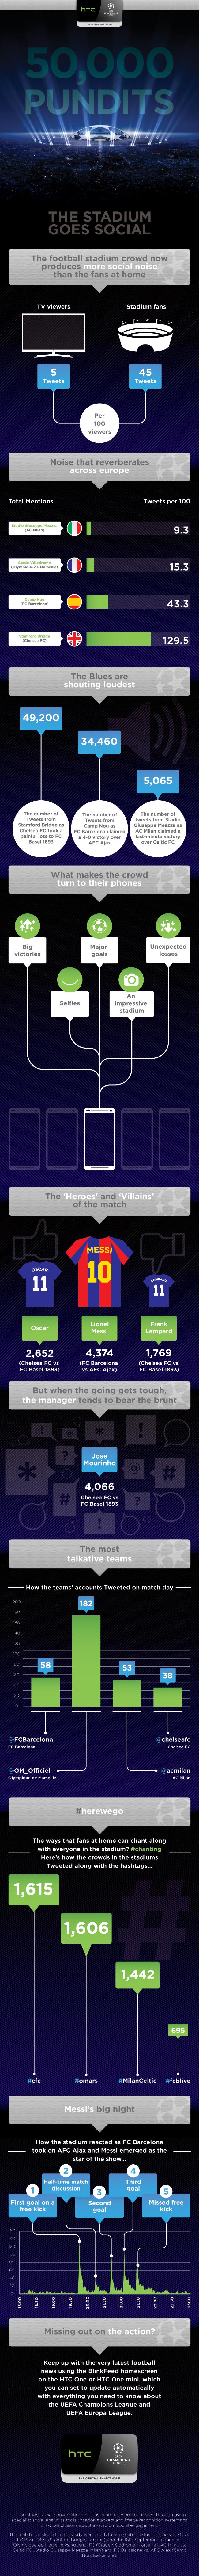 UEFA Infographic